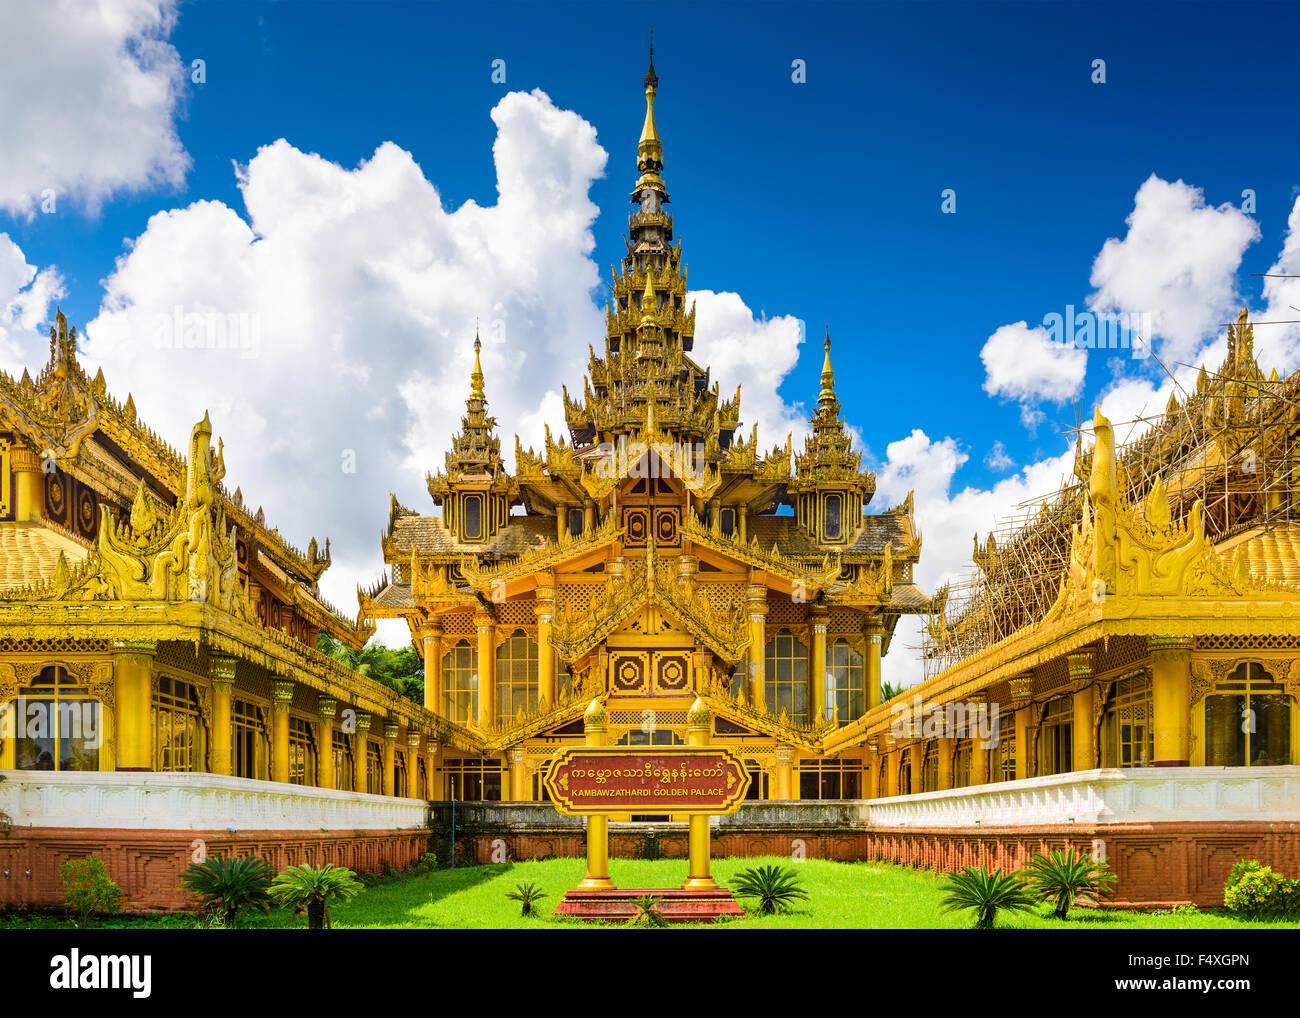 Bago, Myanmar en Kambawzathardi Golden Palace. Foto de stock